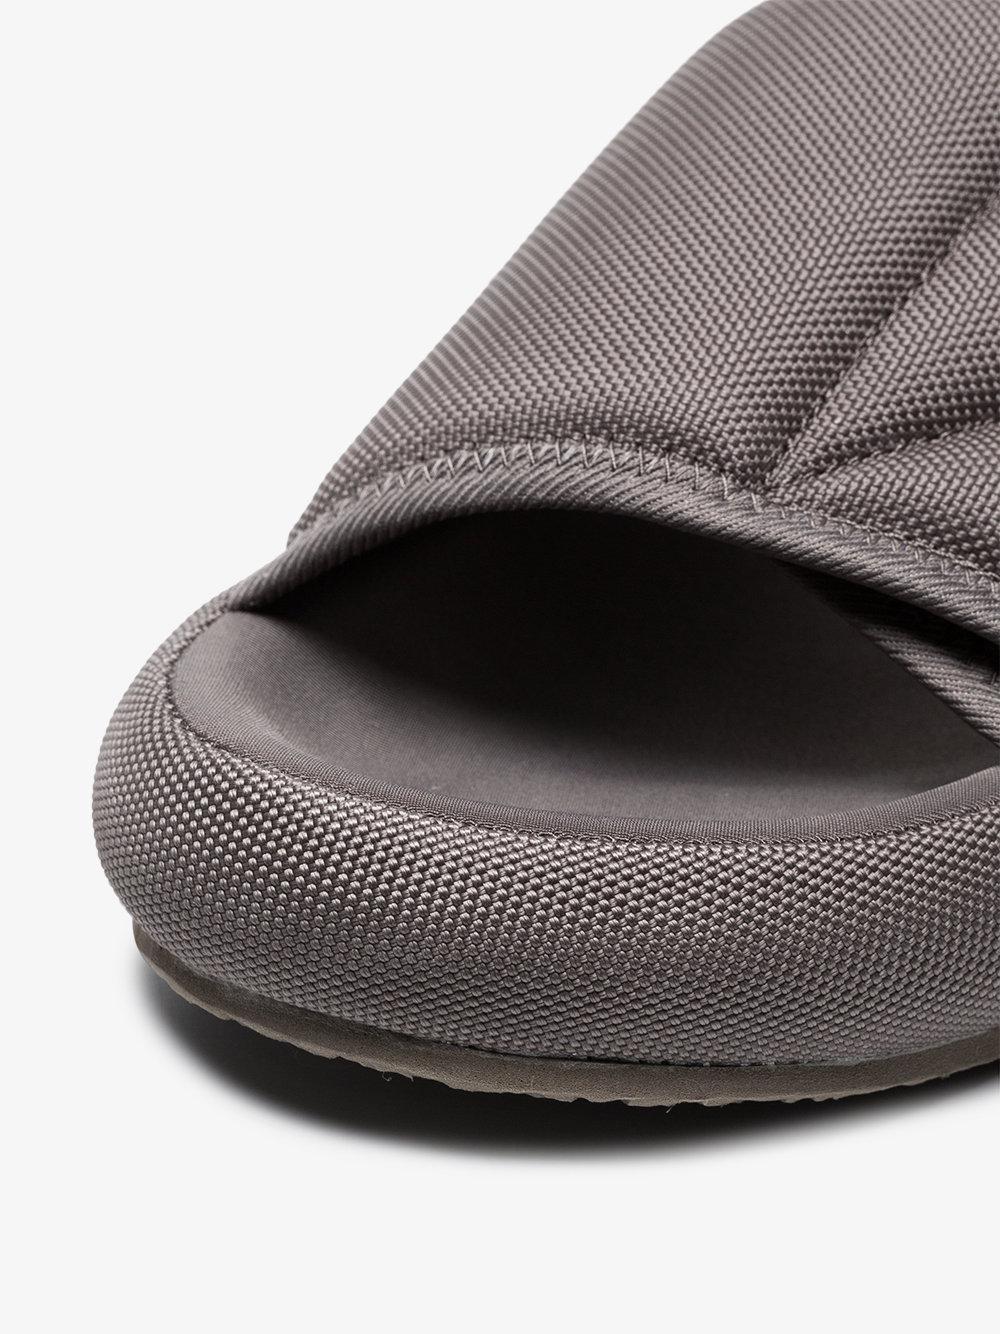 8d7a5da23a6 Lyst - Yeezy Grey Flatform Slippers in Gray